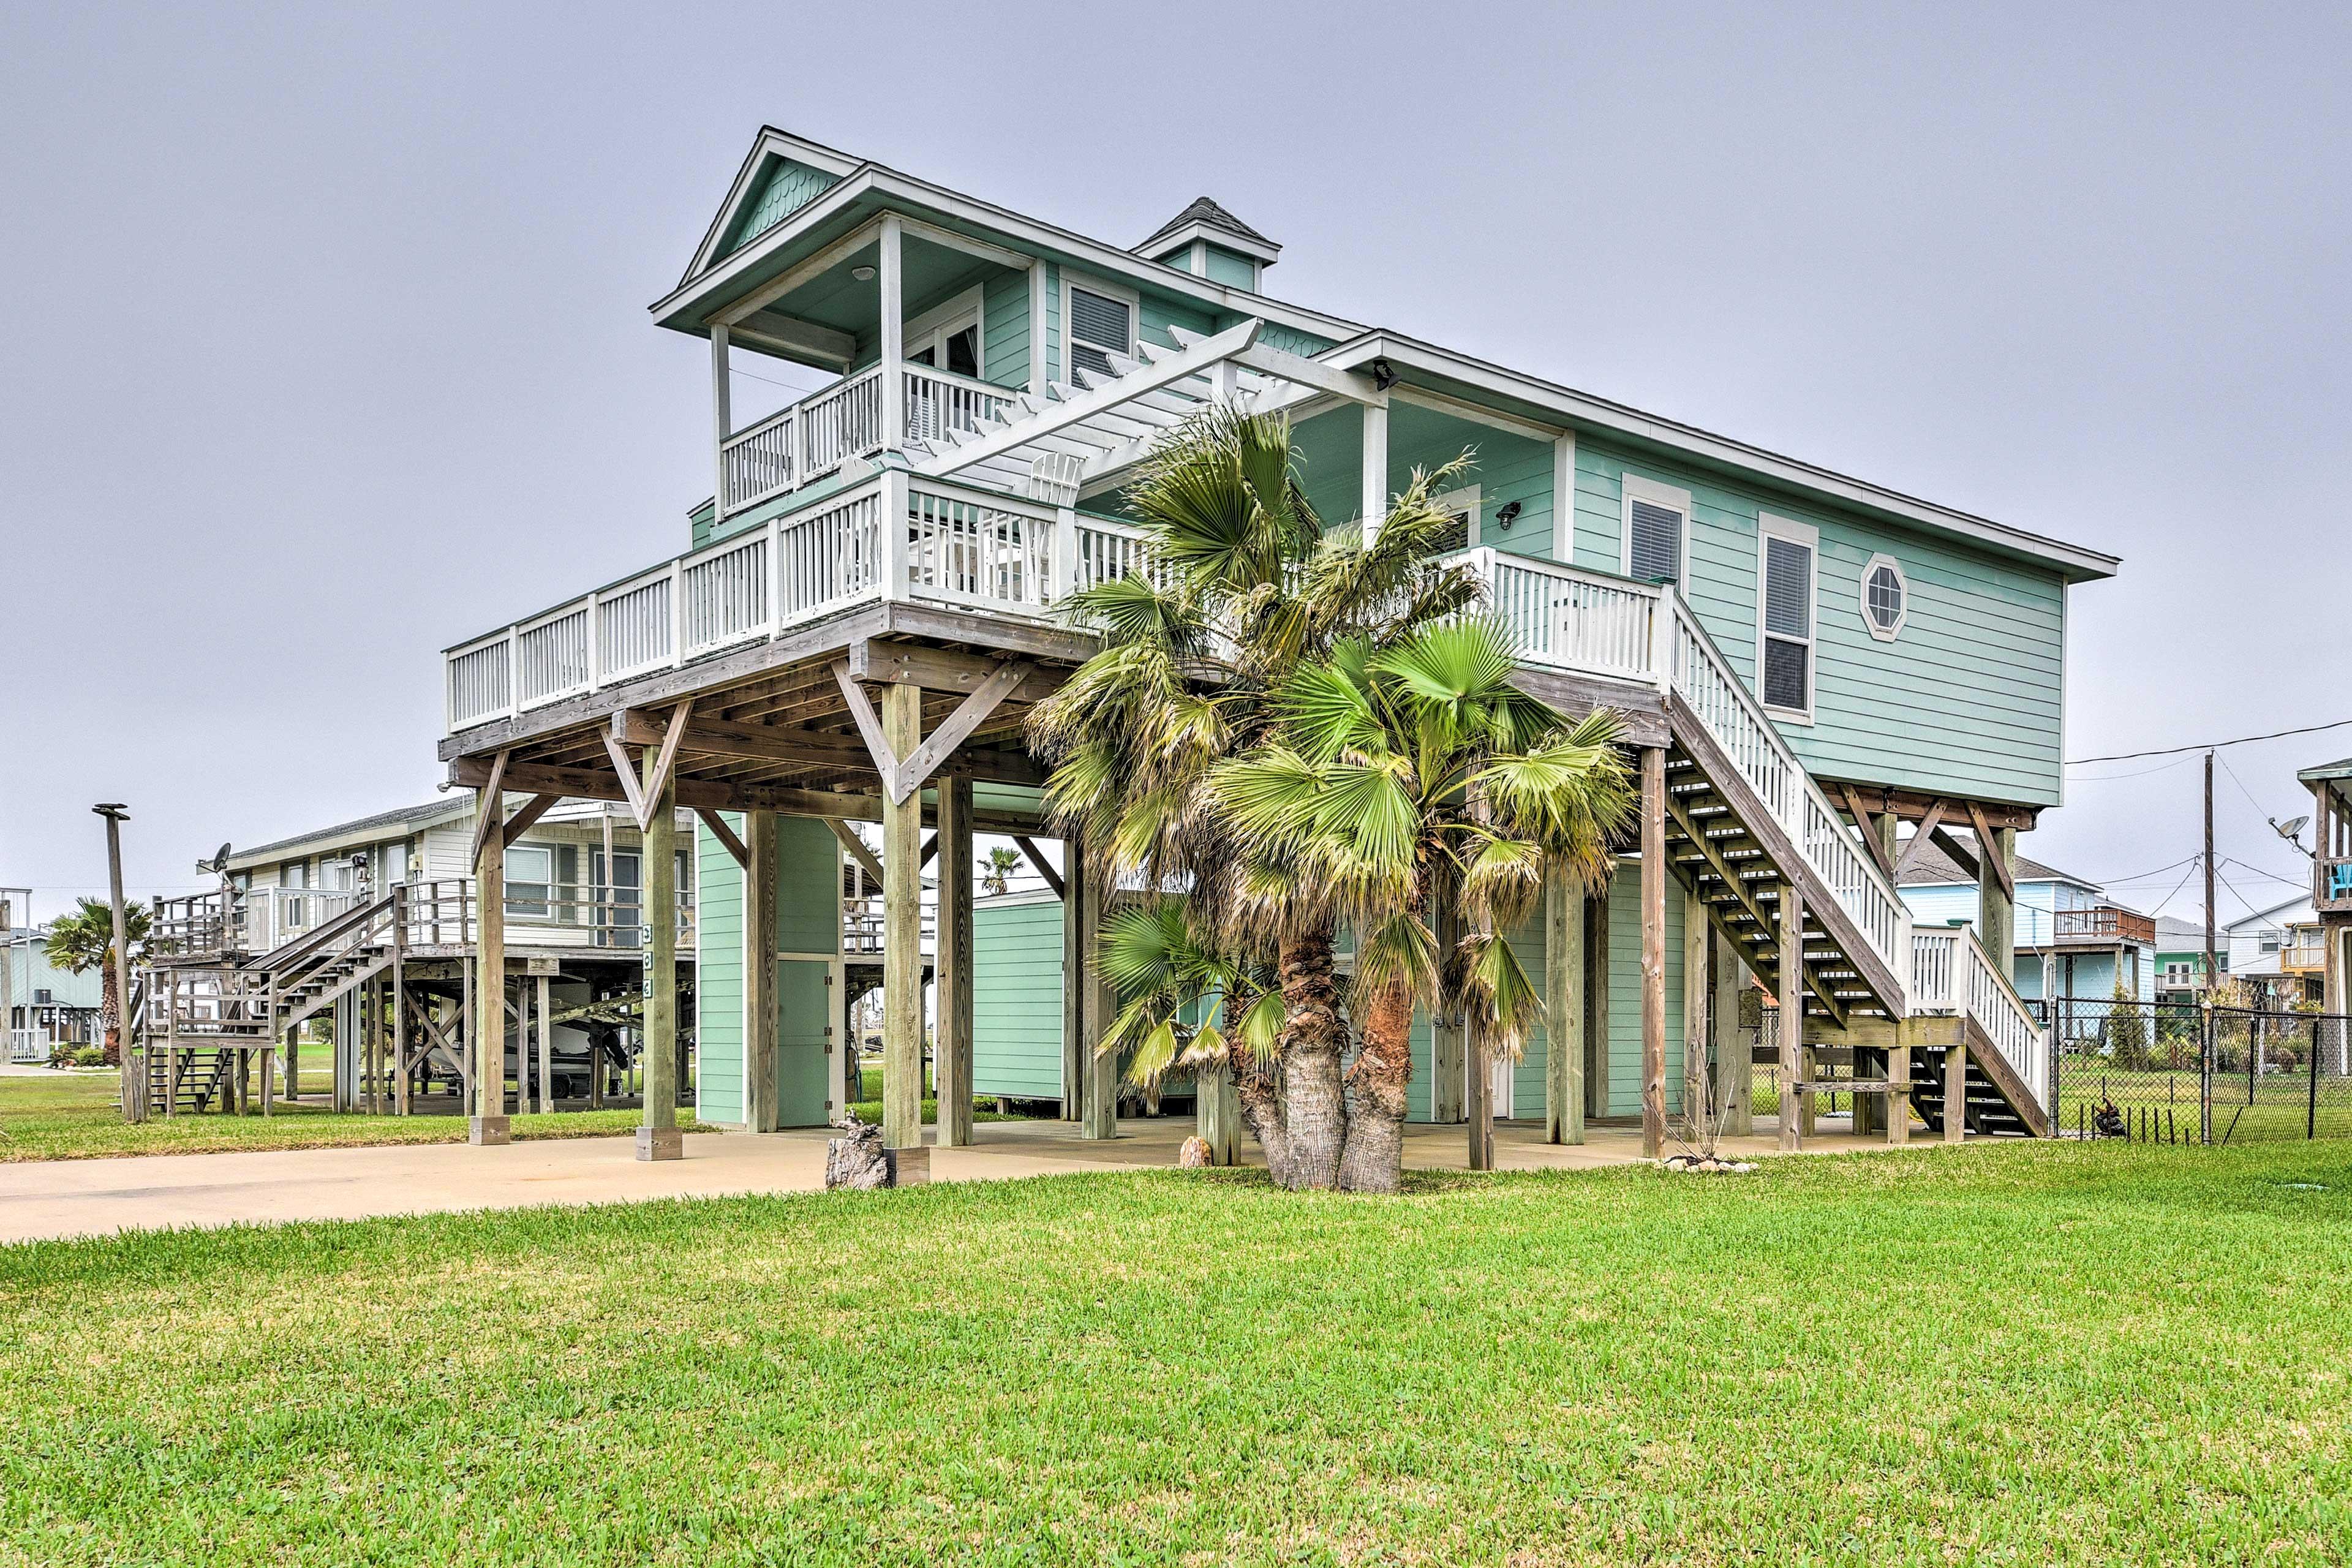 Exterior   Private Deck & Balcony   Yard   Walk to Beach